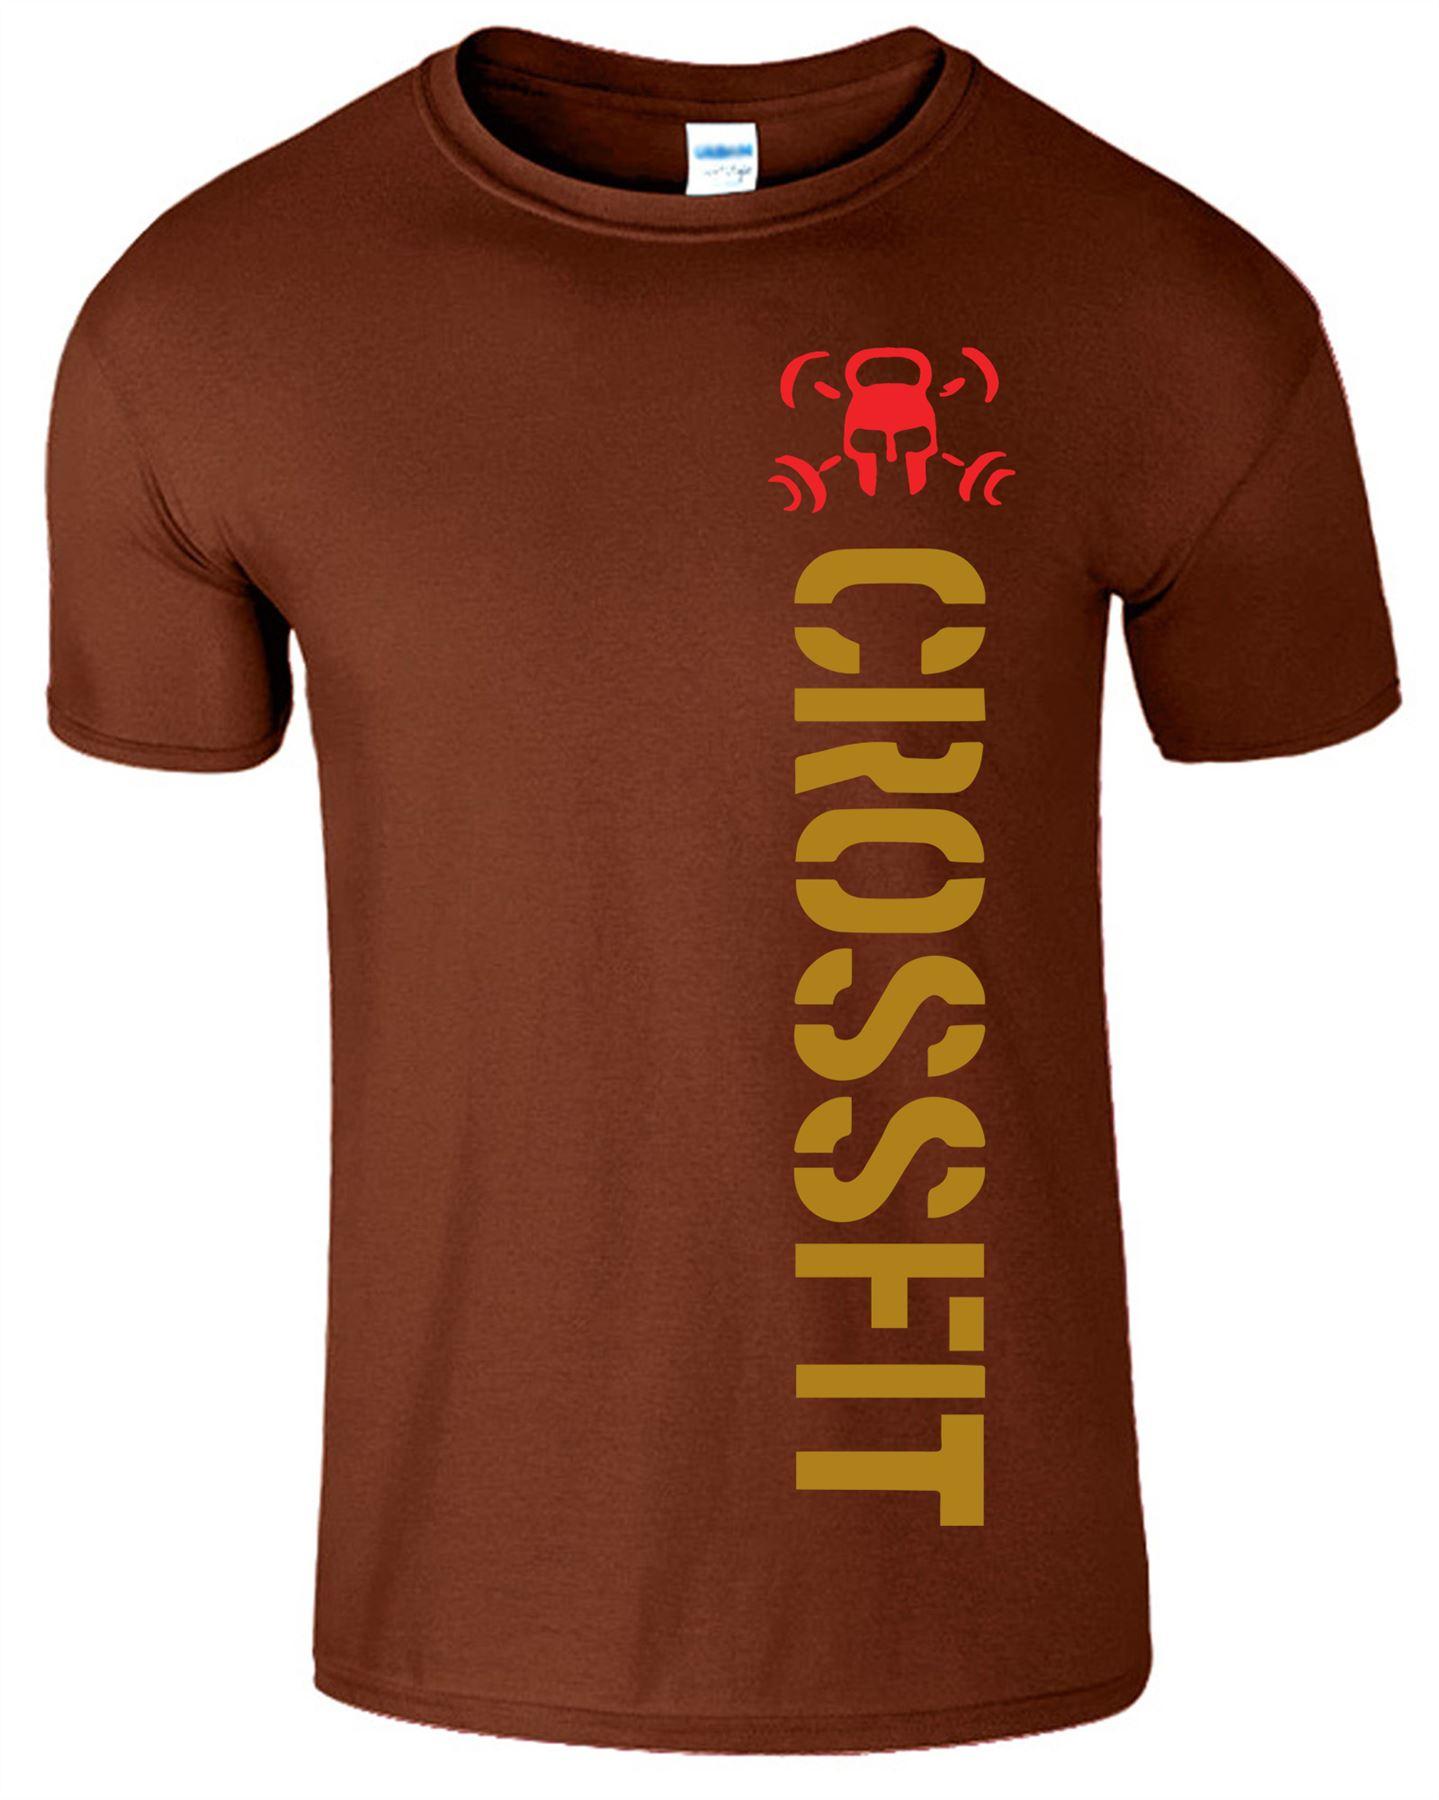 Crossfit-Mens-T-Shirt-Gym-Wear-Bodybuilding-Training-Workout-Fitness-T-Shirt Indexbild 4